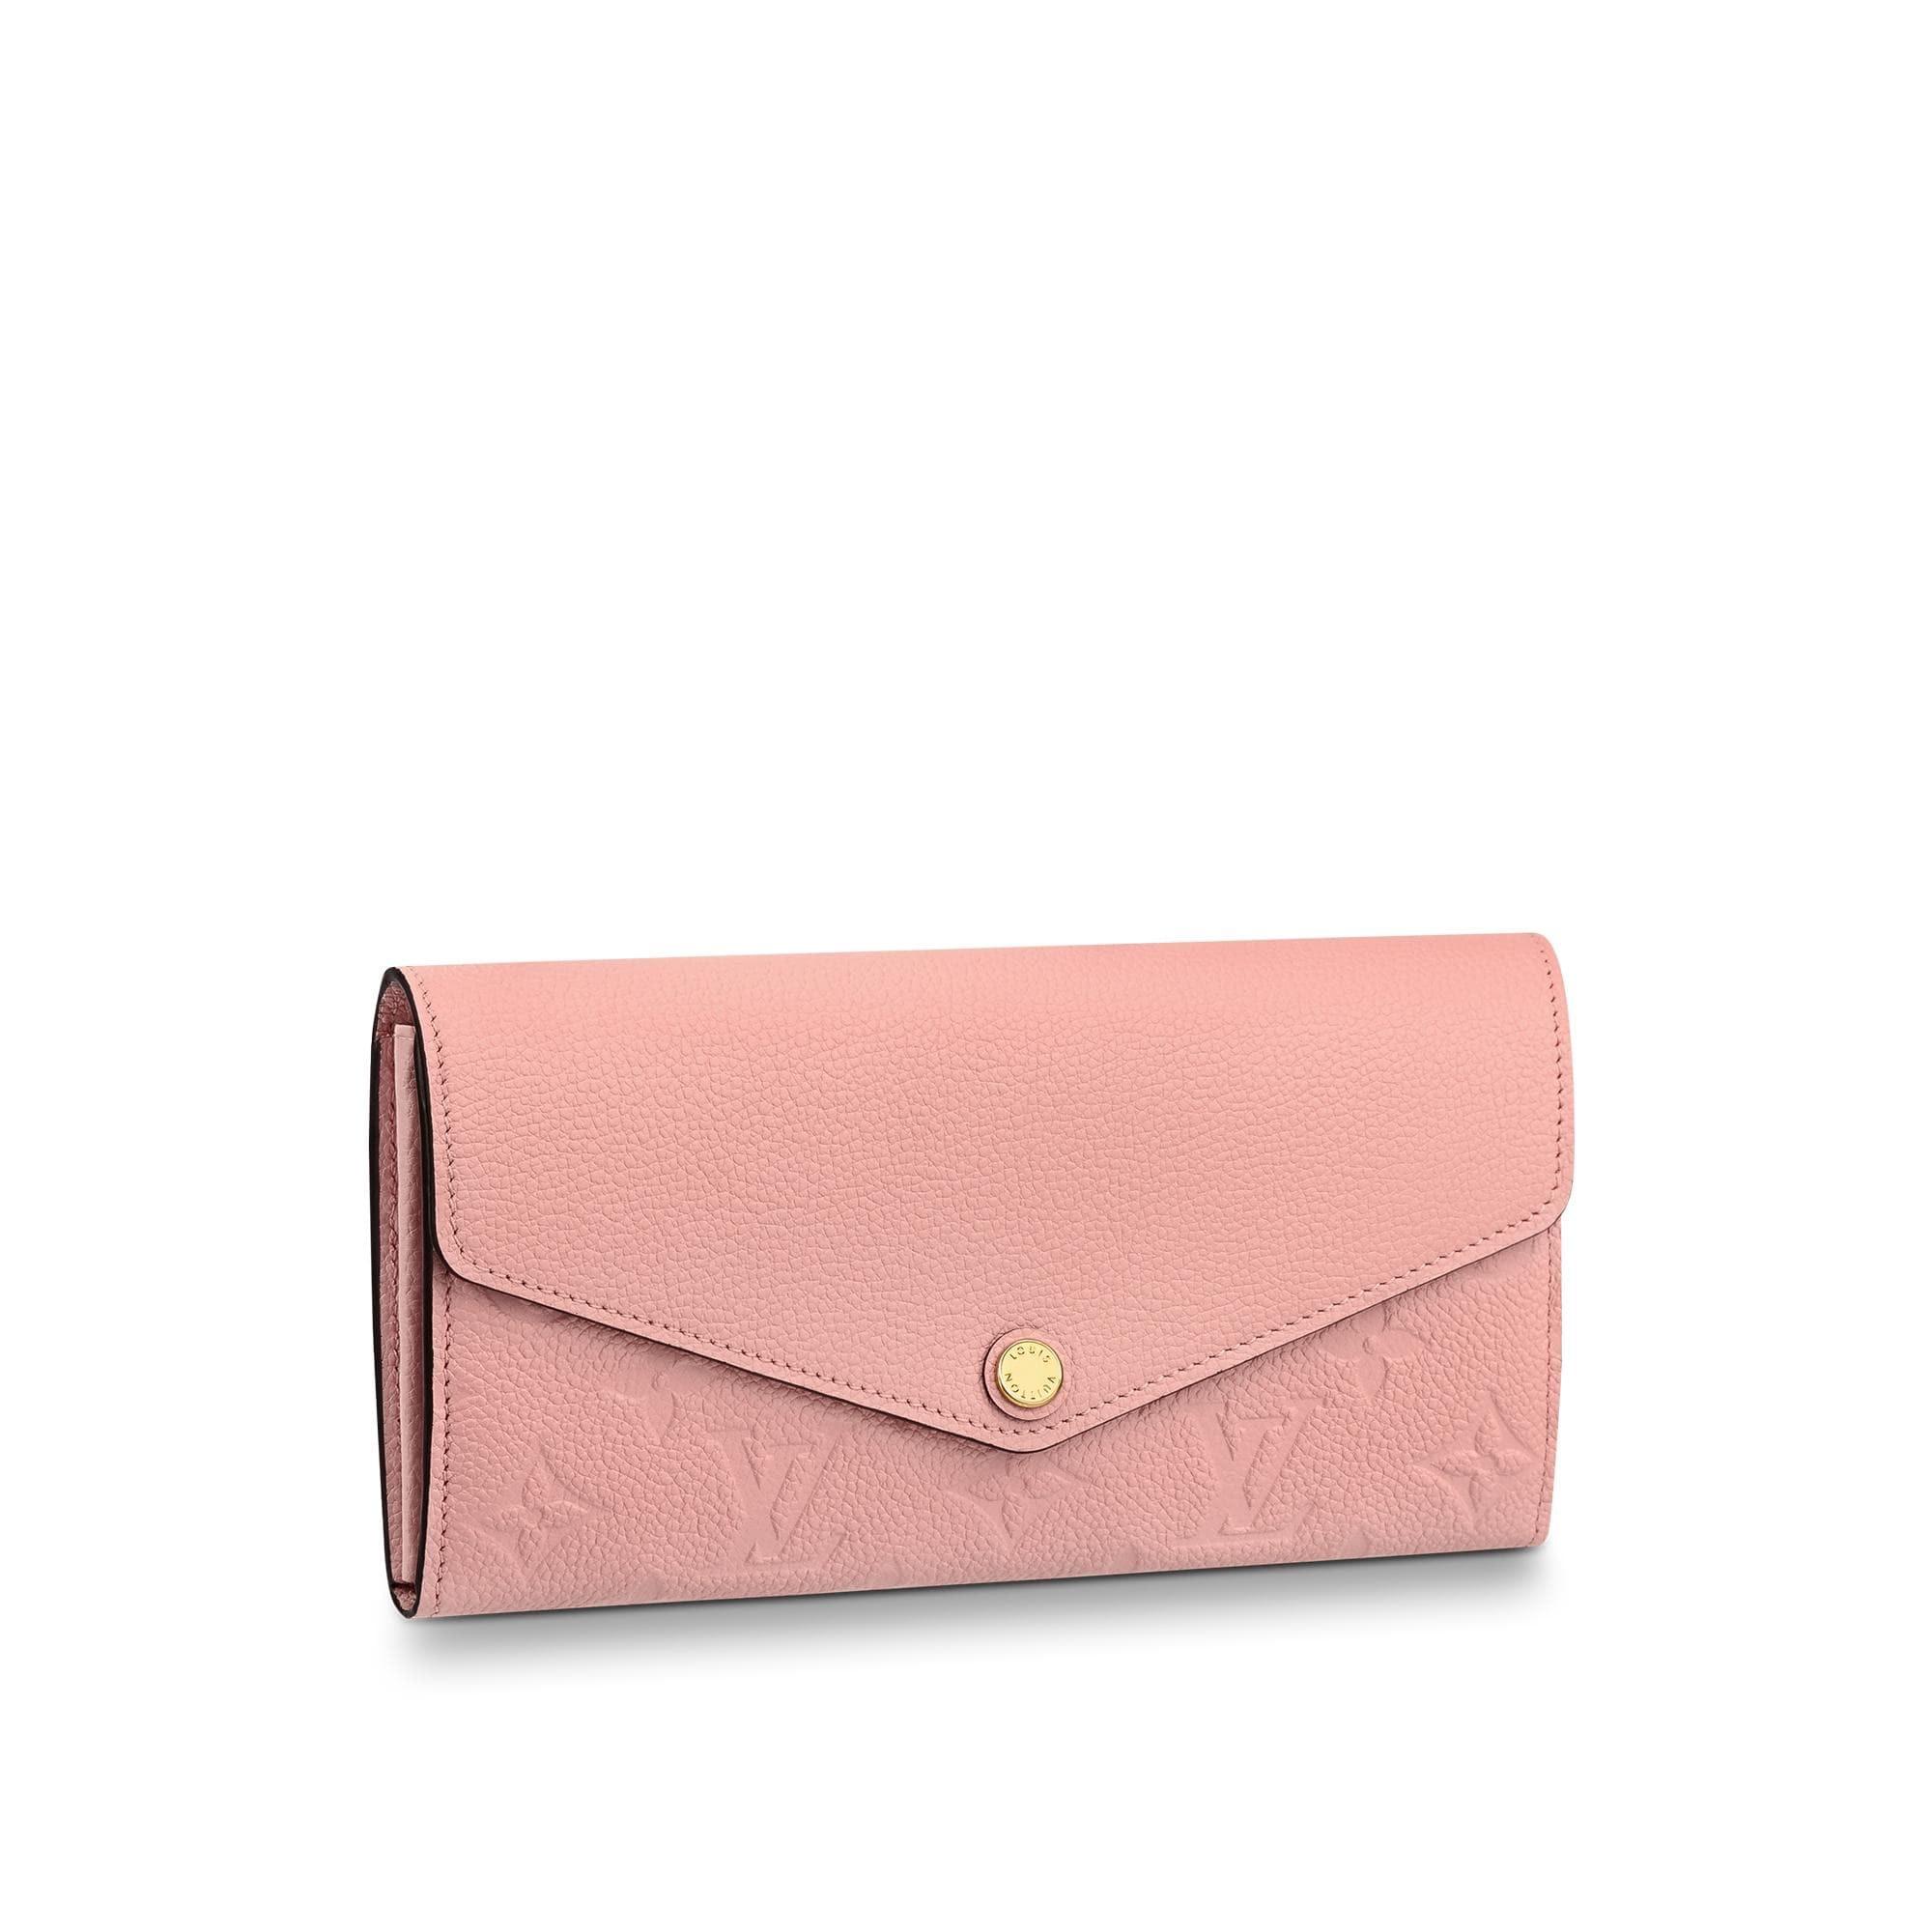 Louis Vuitton Sarah Wallet Monogram Empreinte Rose Poudre